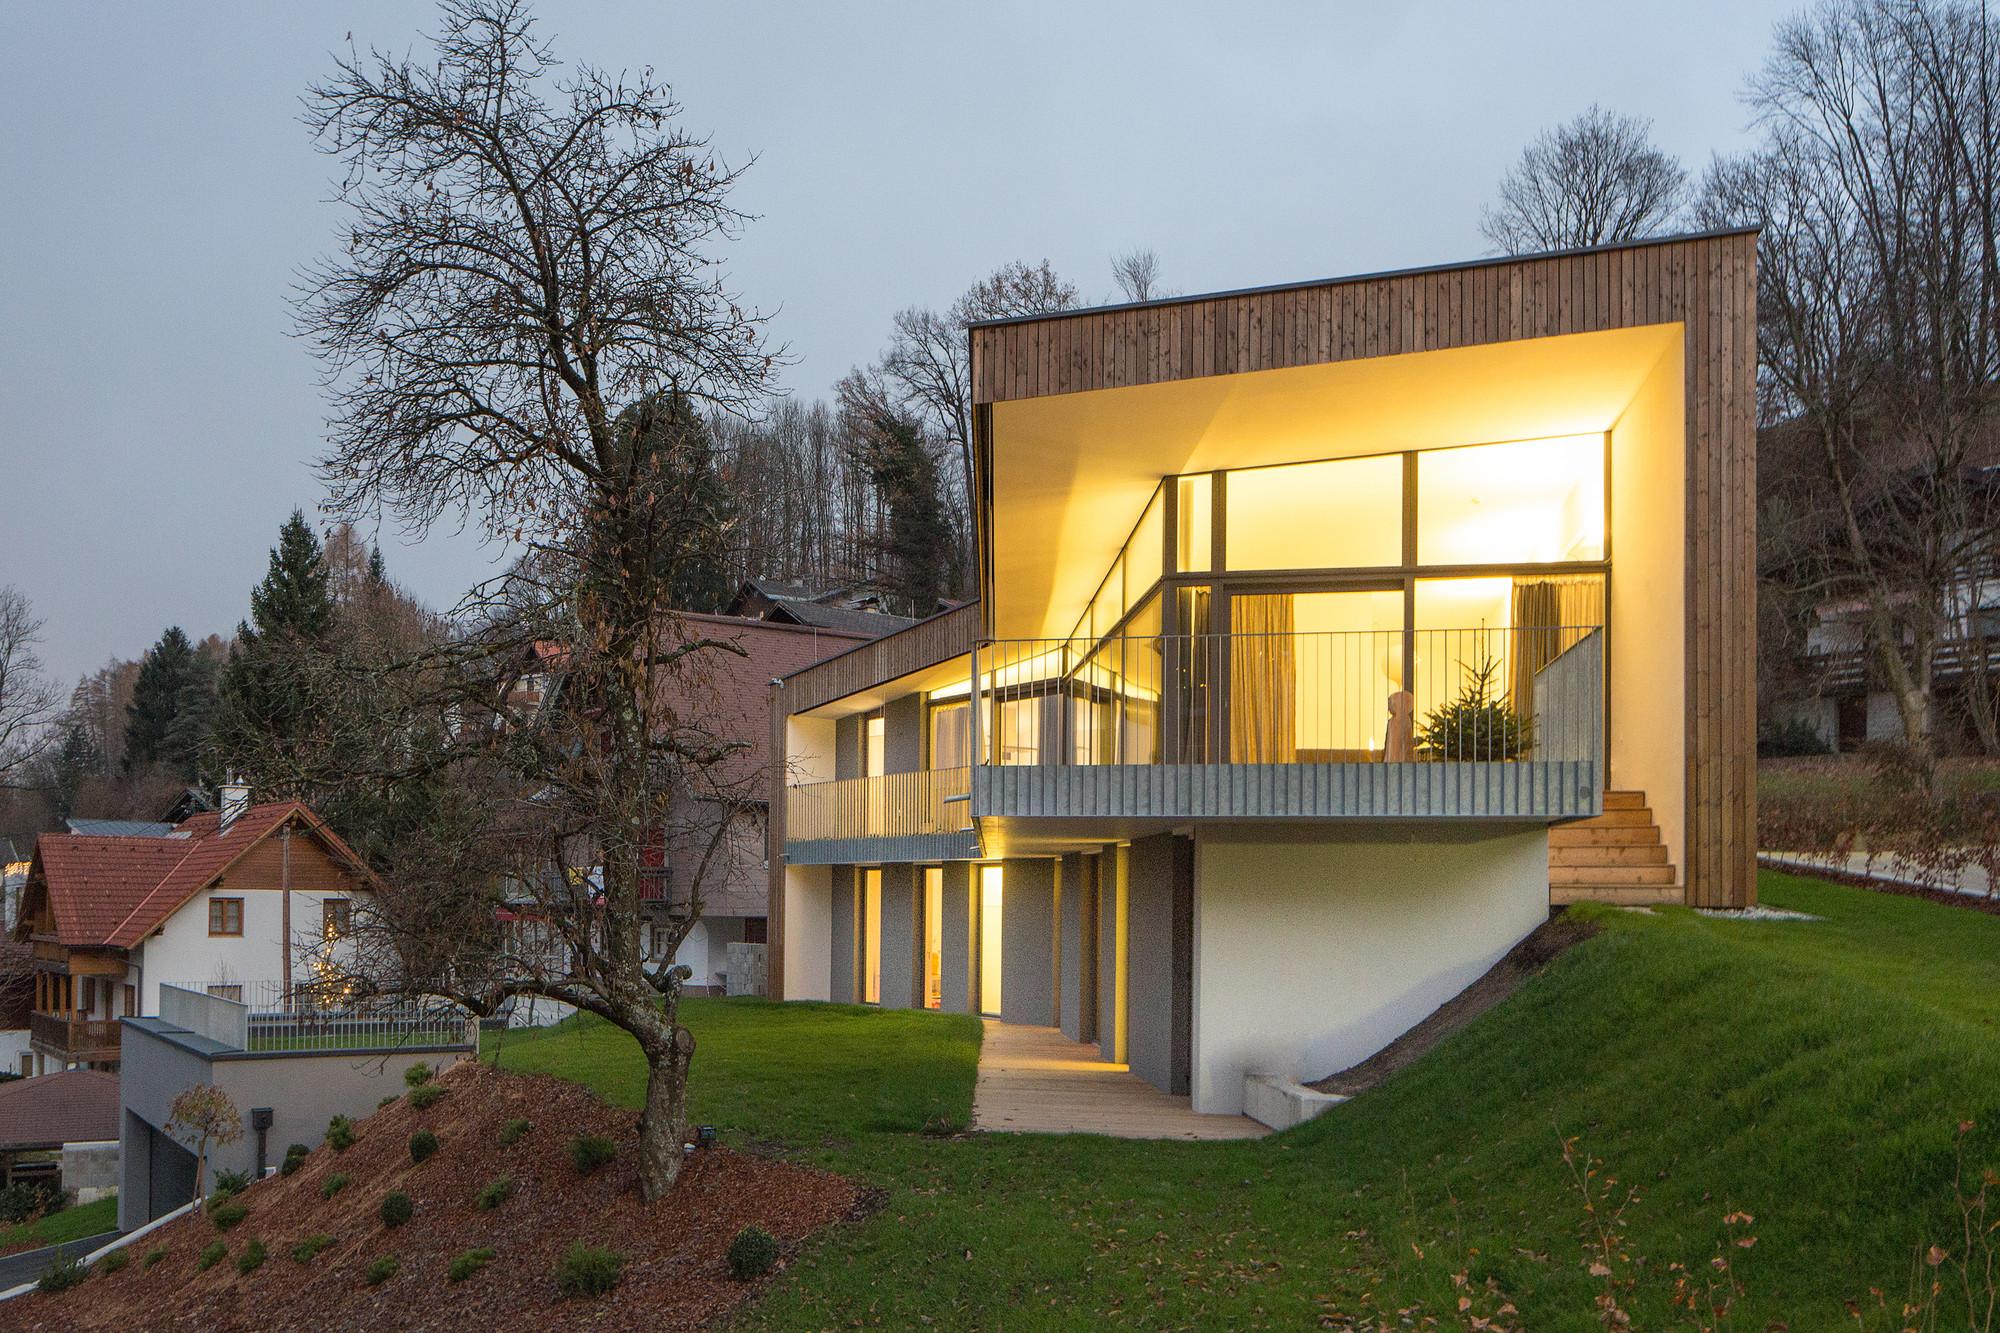 House T / Haro Architects, © Stefan Zauner